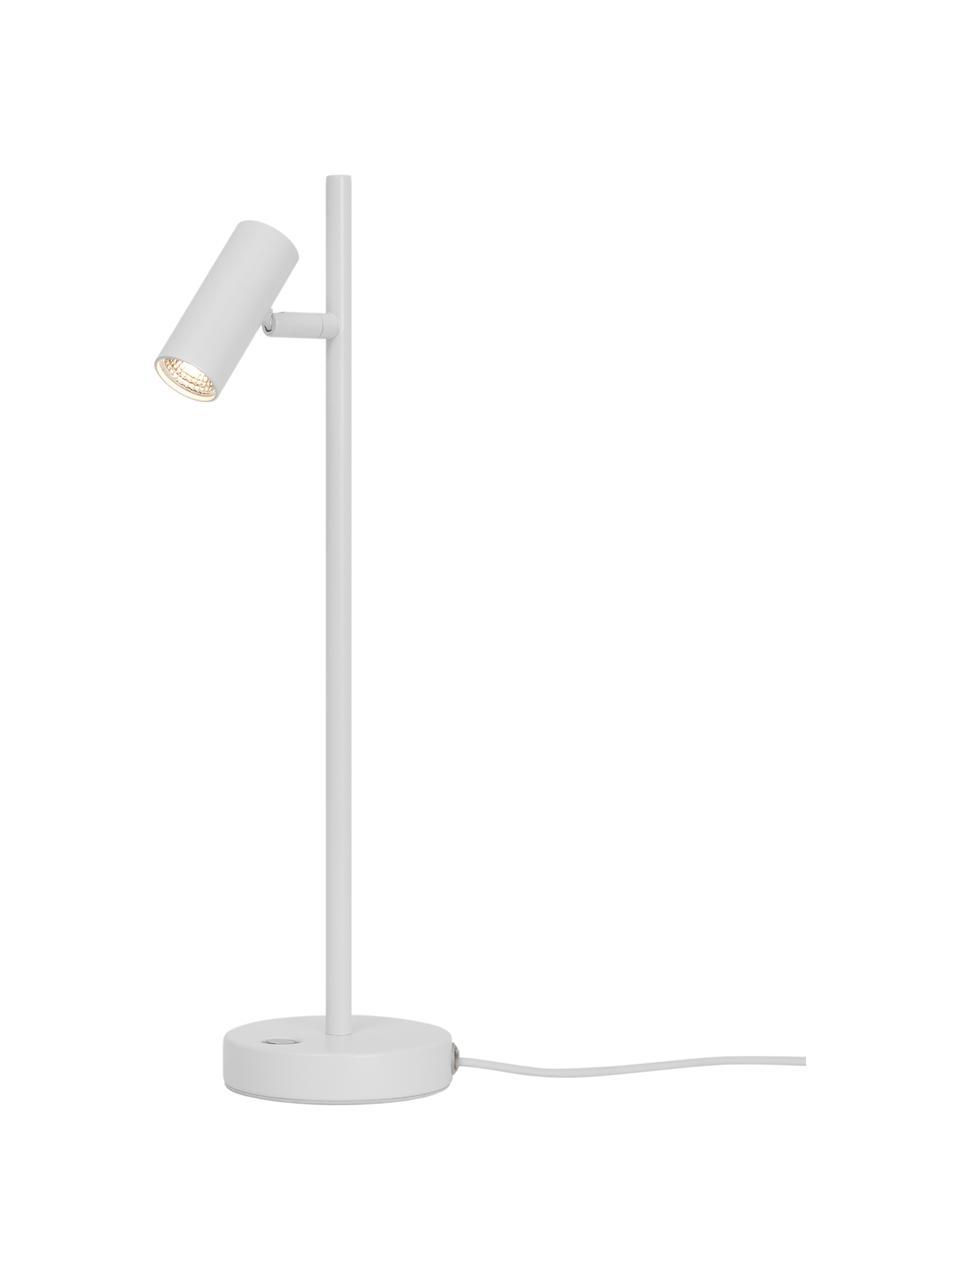 Dimmbare LED-Schreibtischlampe Omari in Weiß, Lampenschirm: Metall, beschichtet, Lampenfuß: Metall, beschichtet, Weiß, 10 x 40 cm